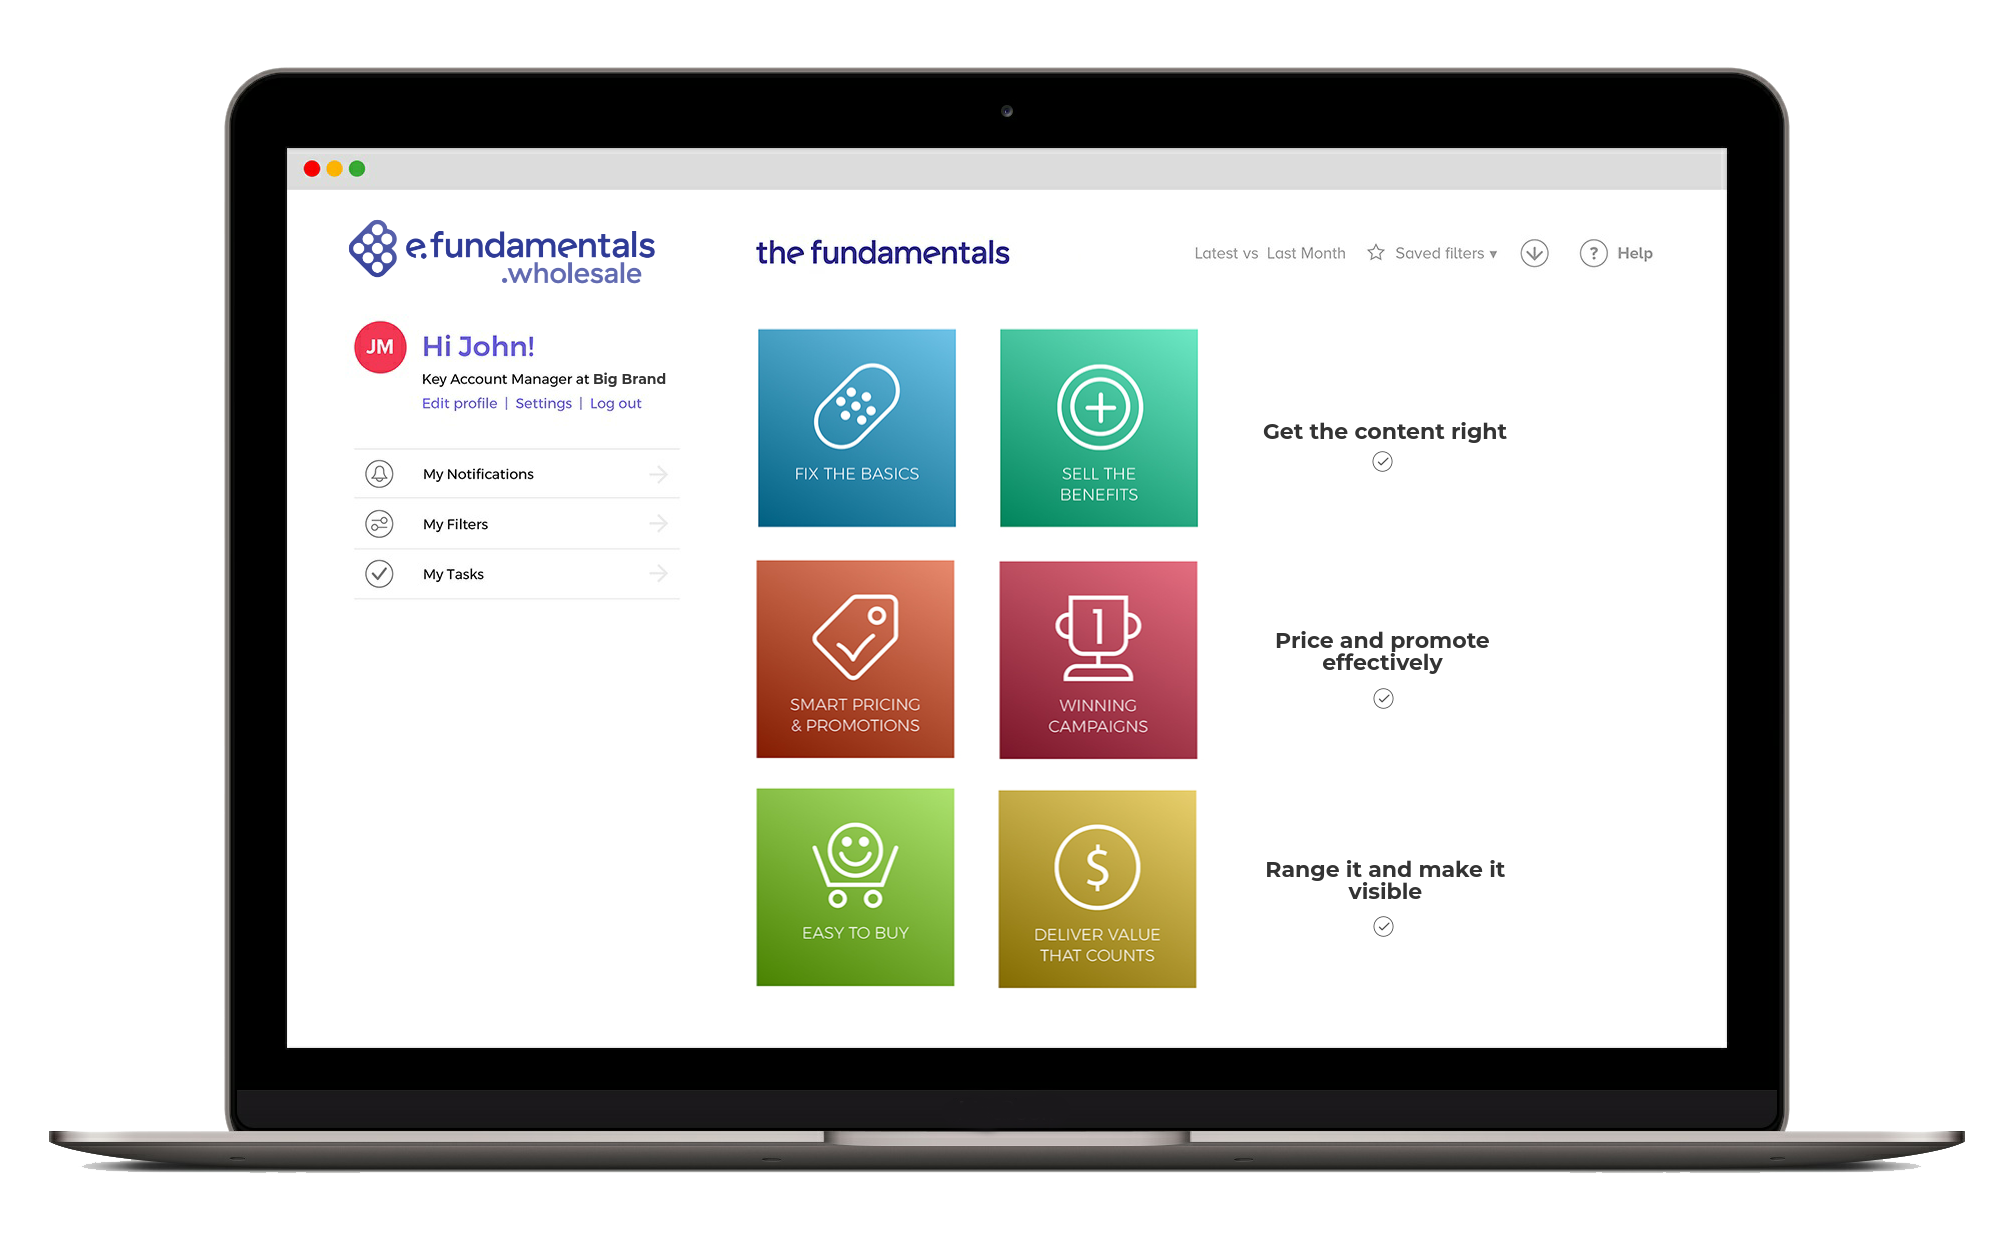 Wholesale e.fundamentals platform image